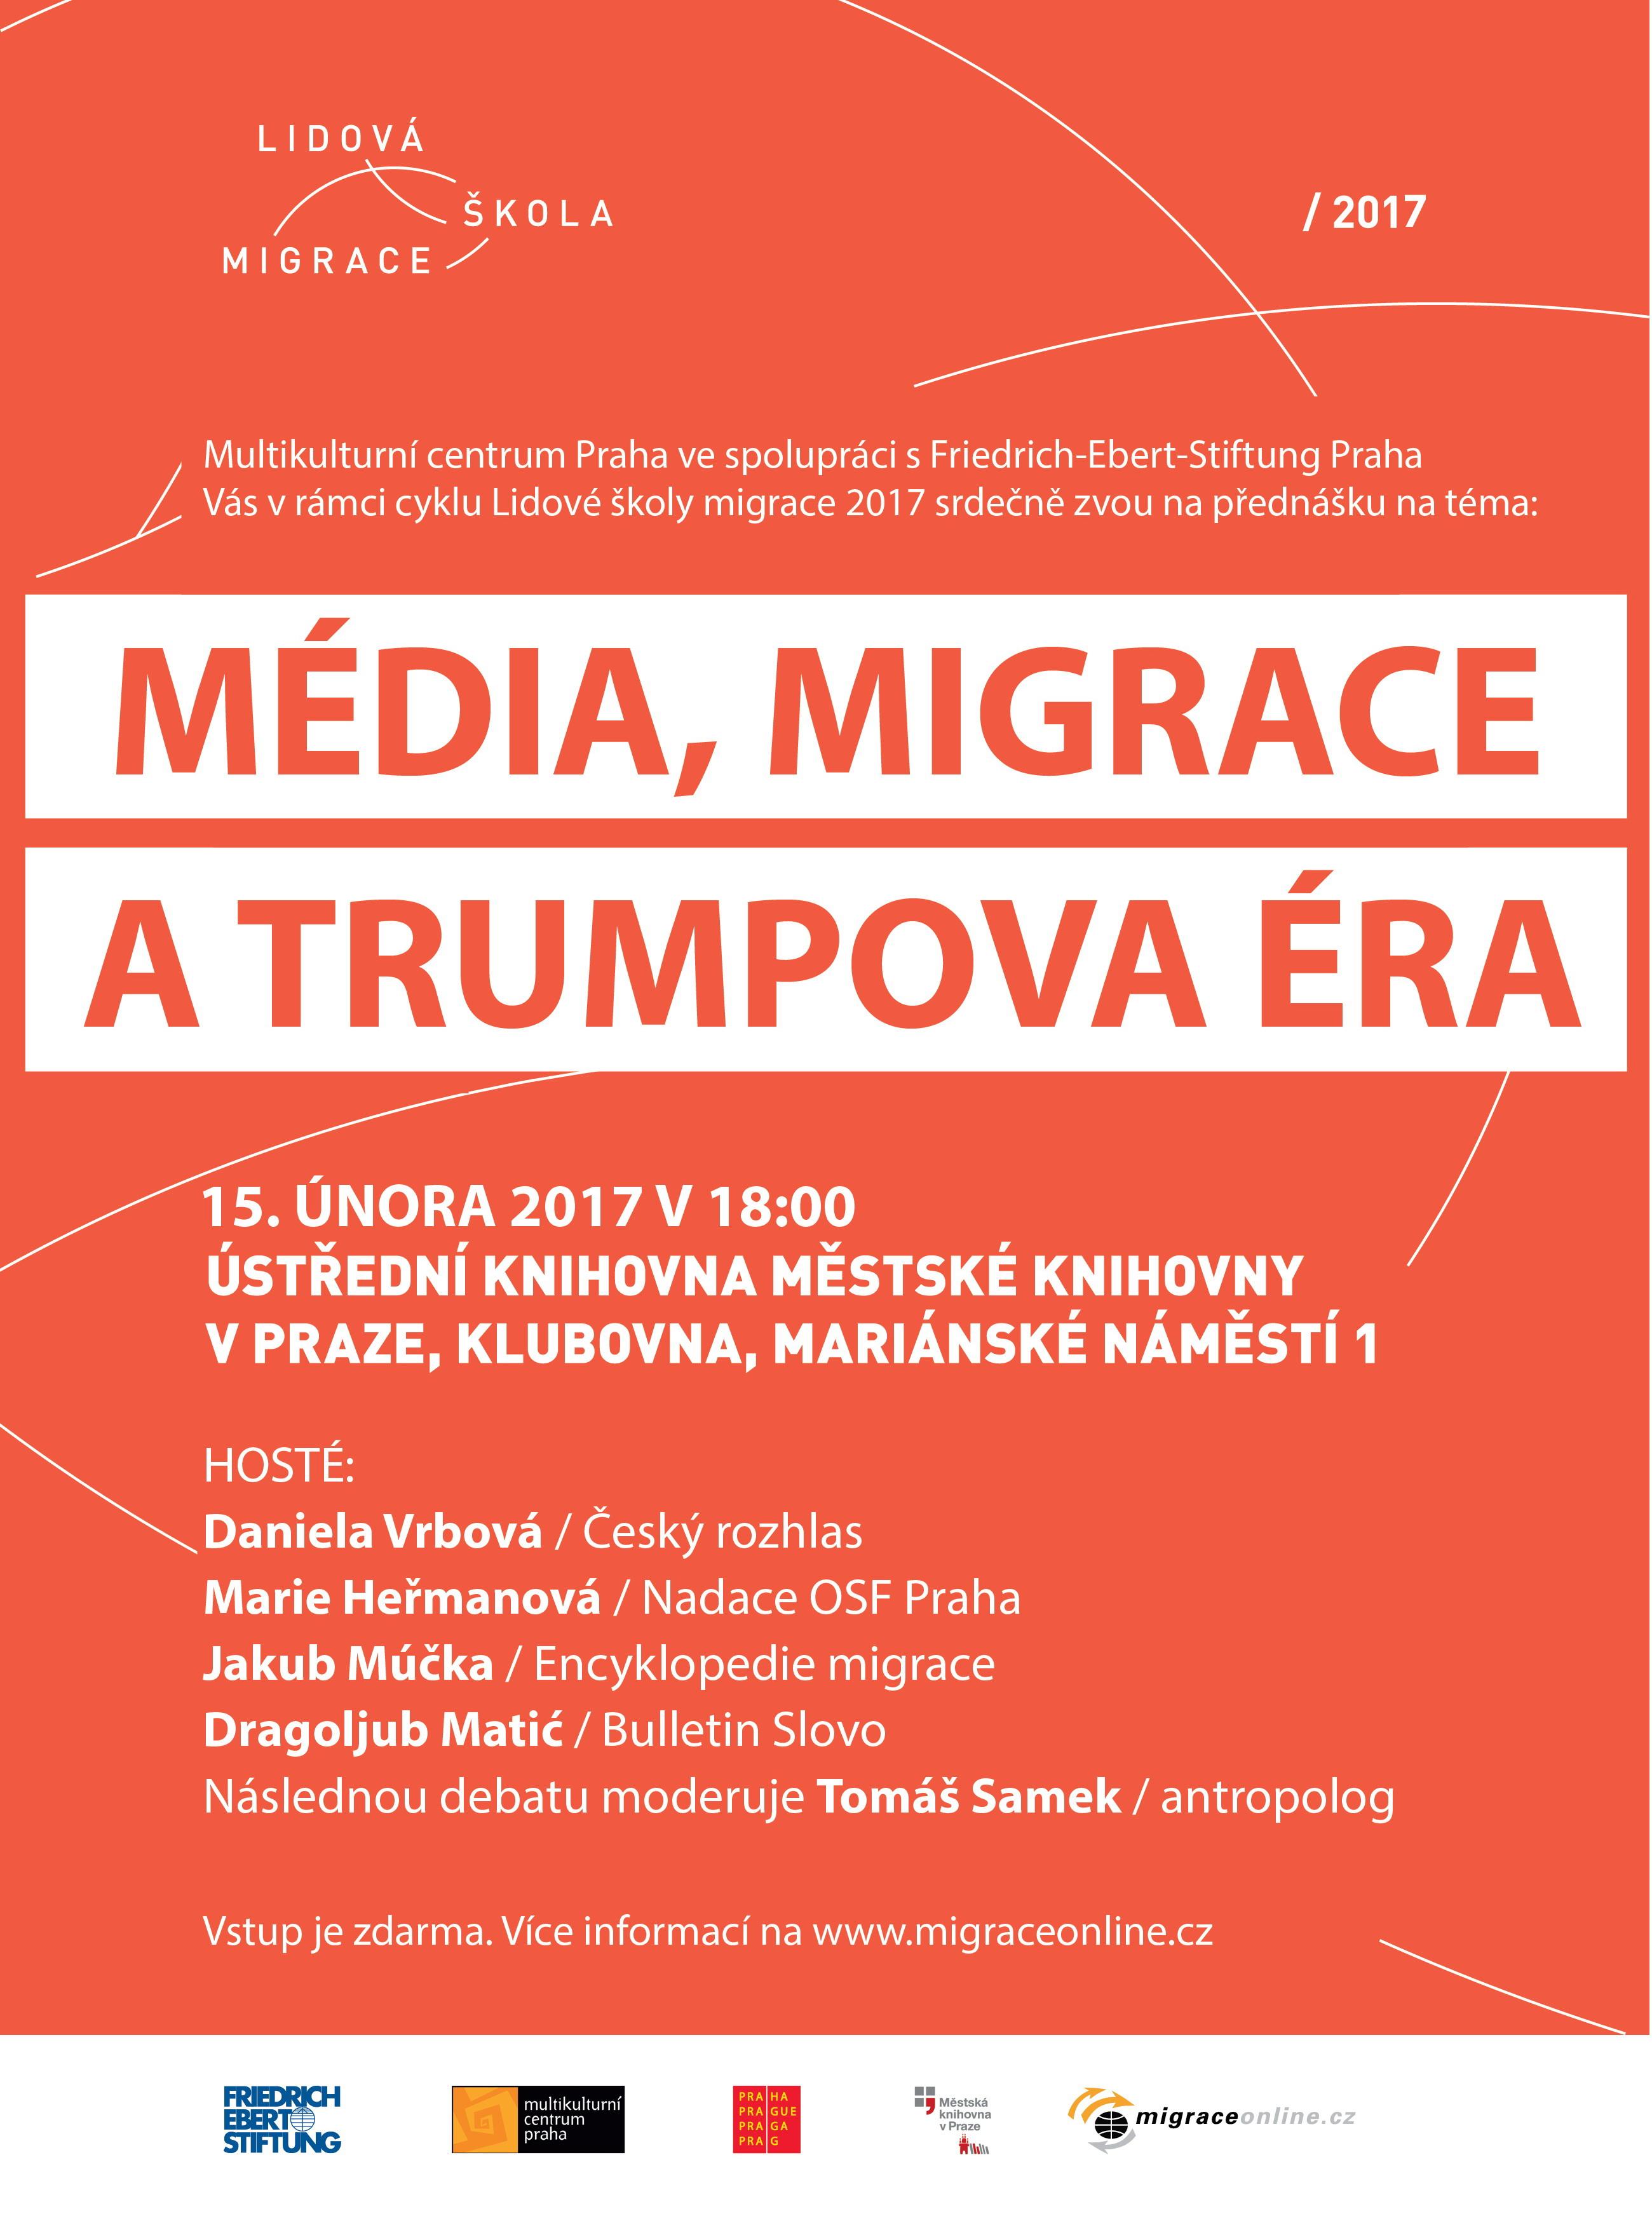 LSM_pozvanka_A4_media_migrace_trump.jpg